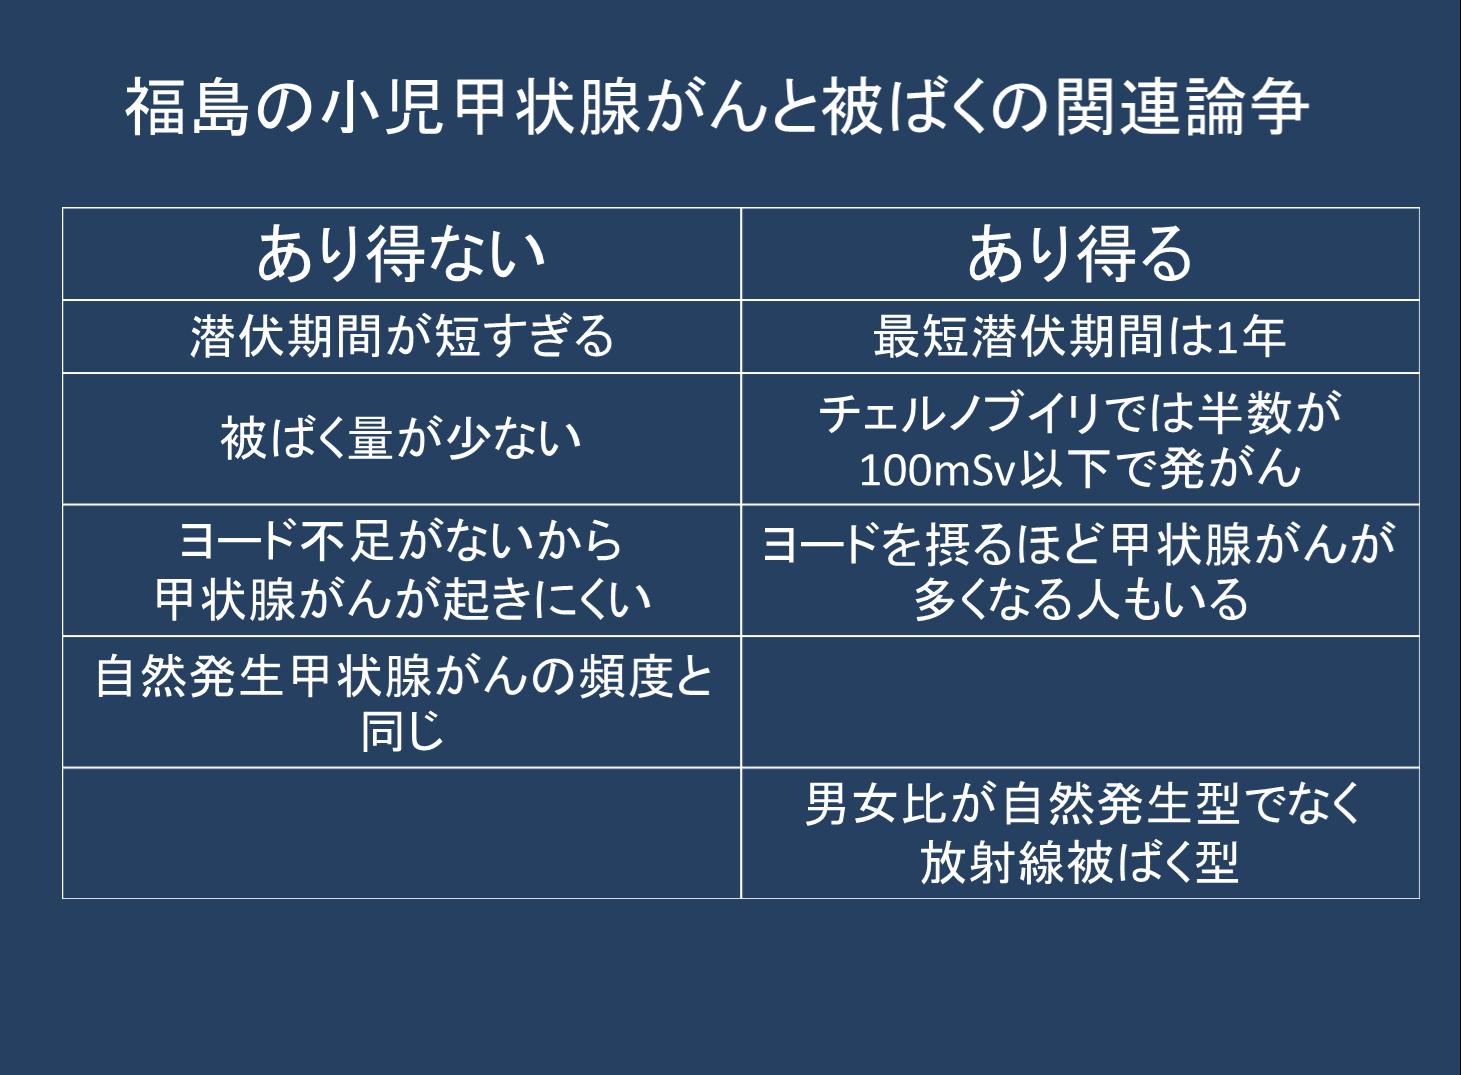 DrMatsuzaki006.png